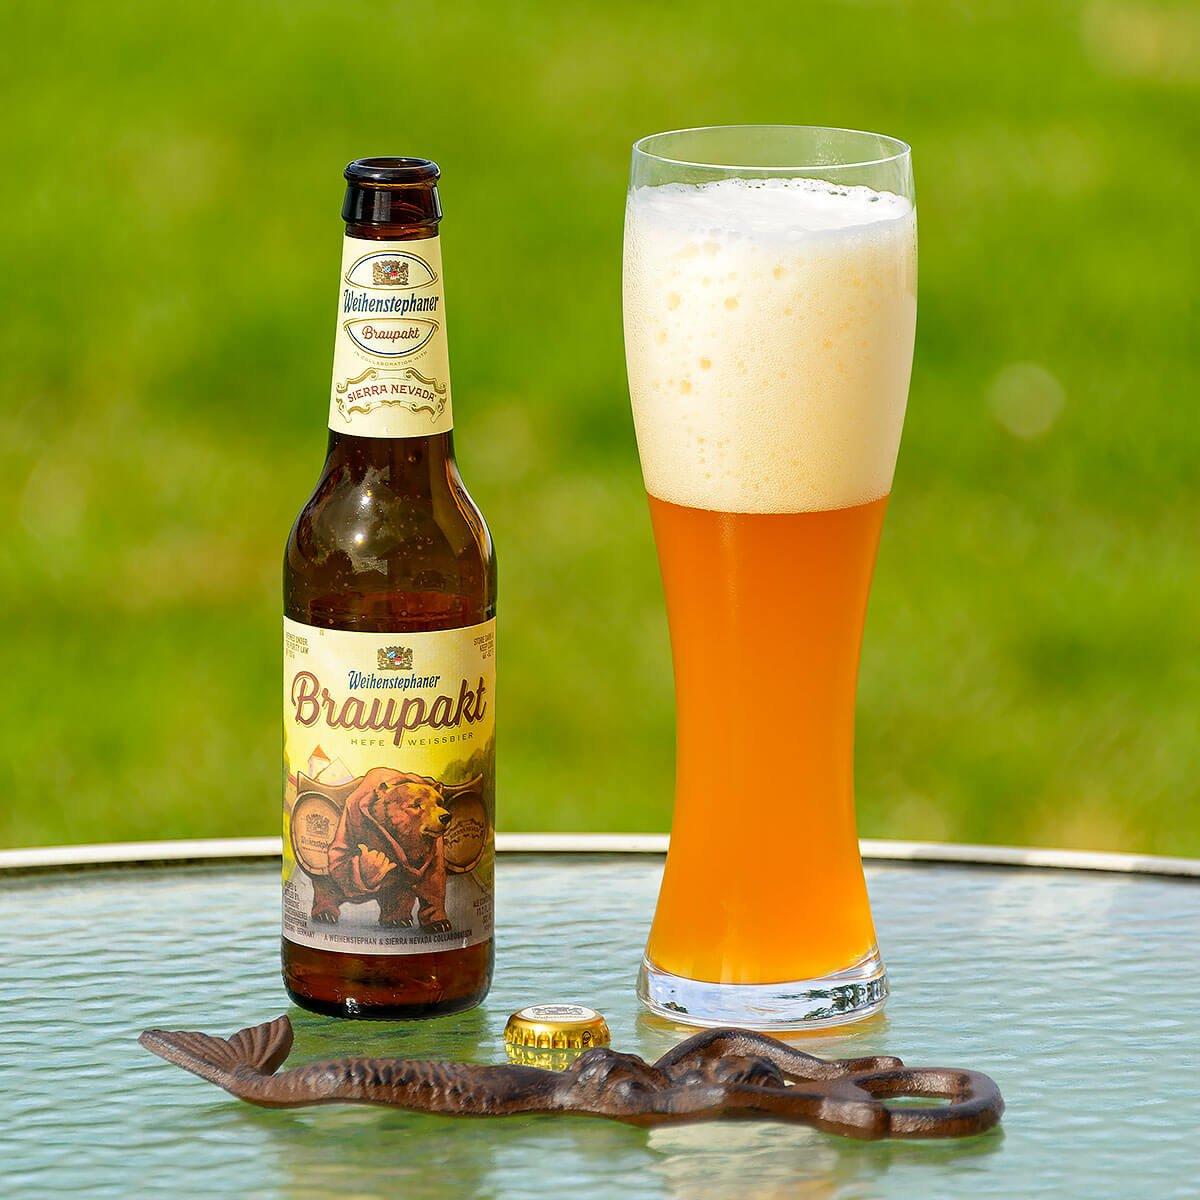 Braupakt, a German-style Hefeweizen collaboratively brewed by Bayerische Staatsbrauerei Weihenstephan and American craft brewing giant Sierra Nevada Brewing Co.